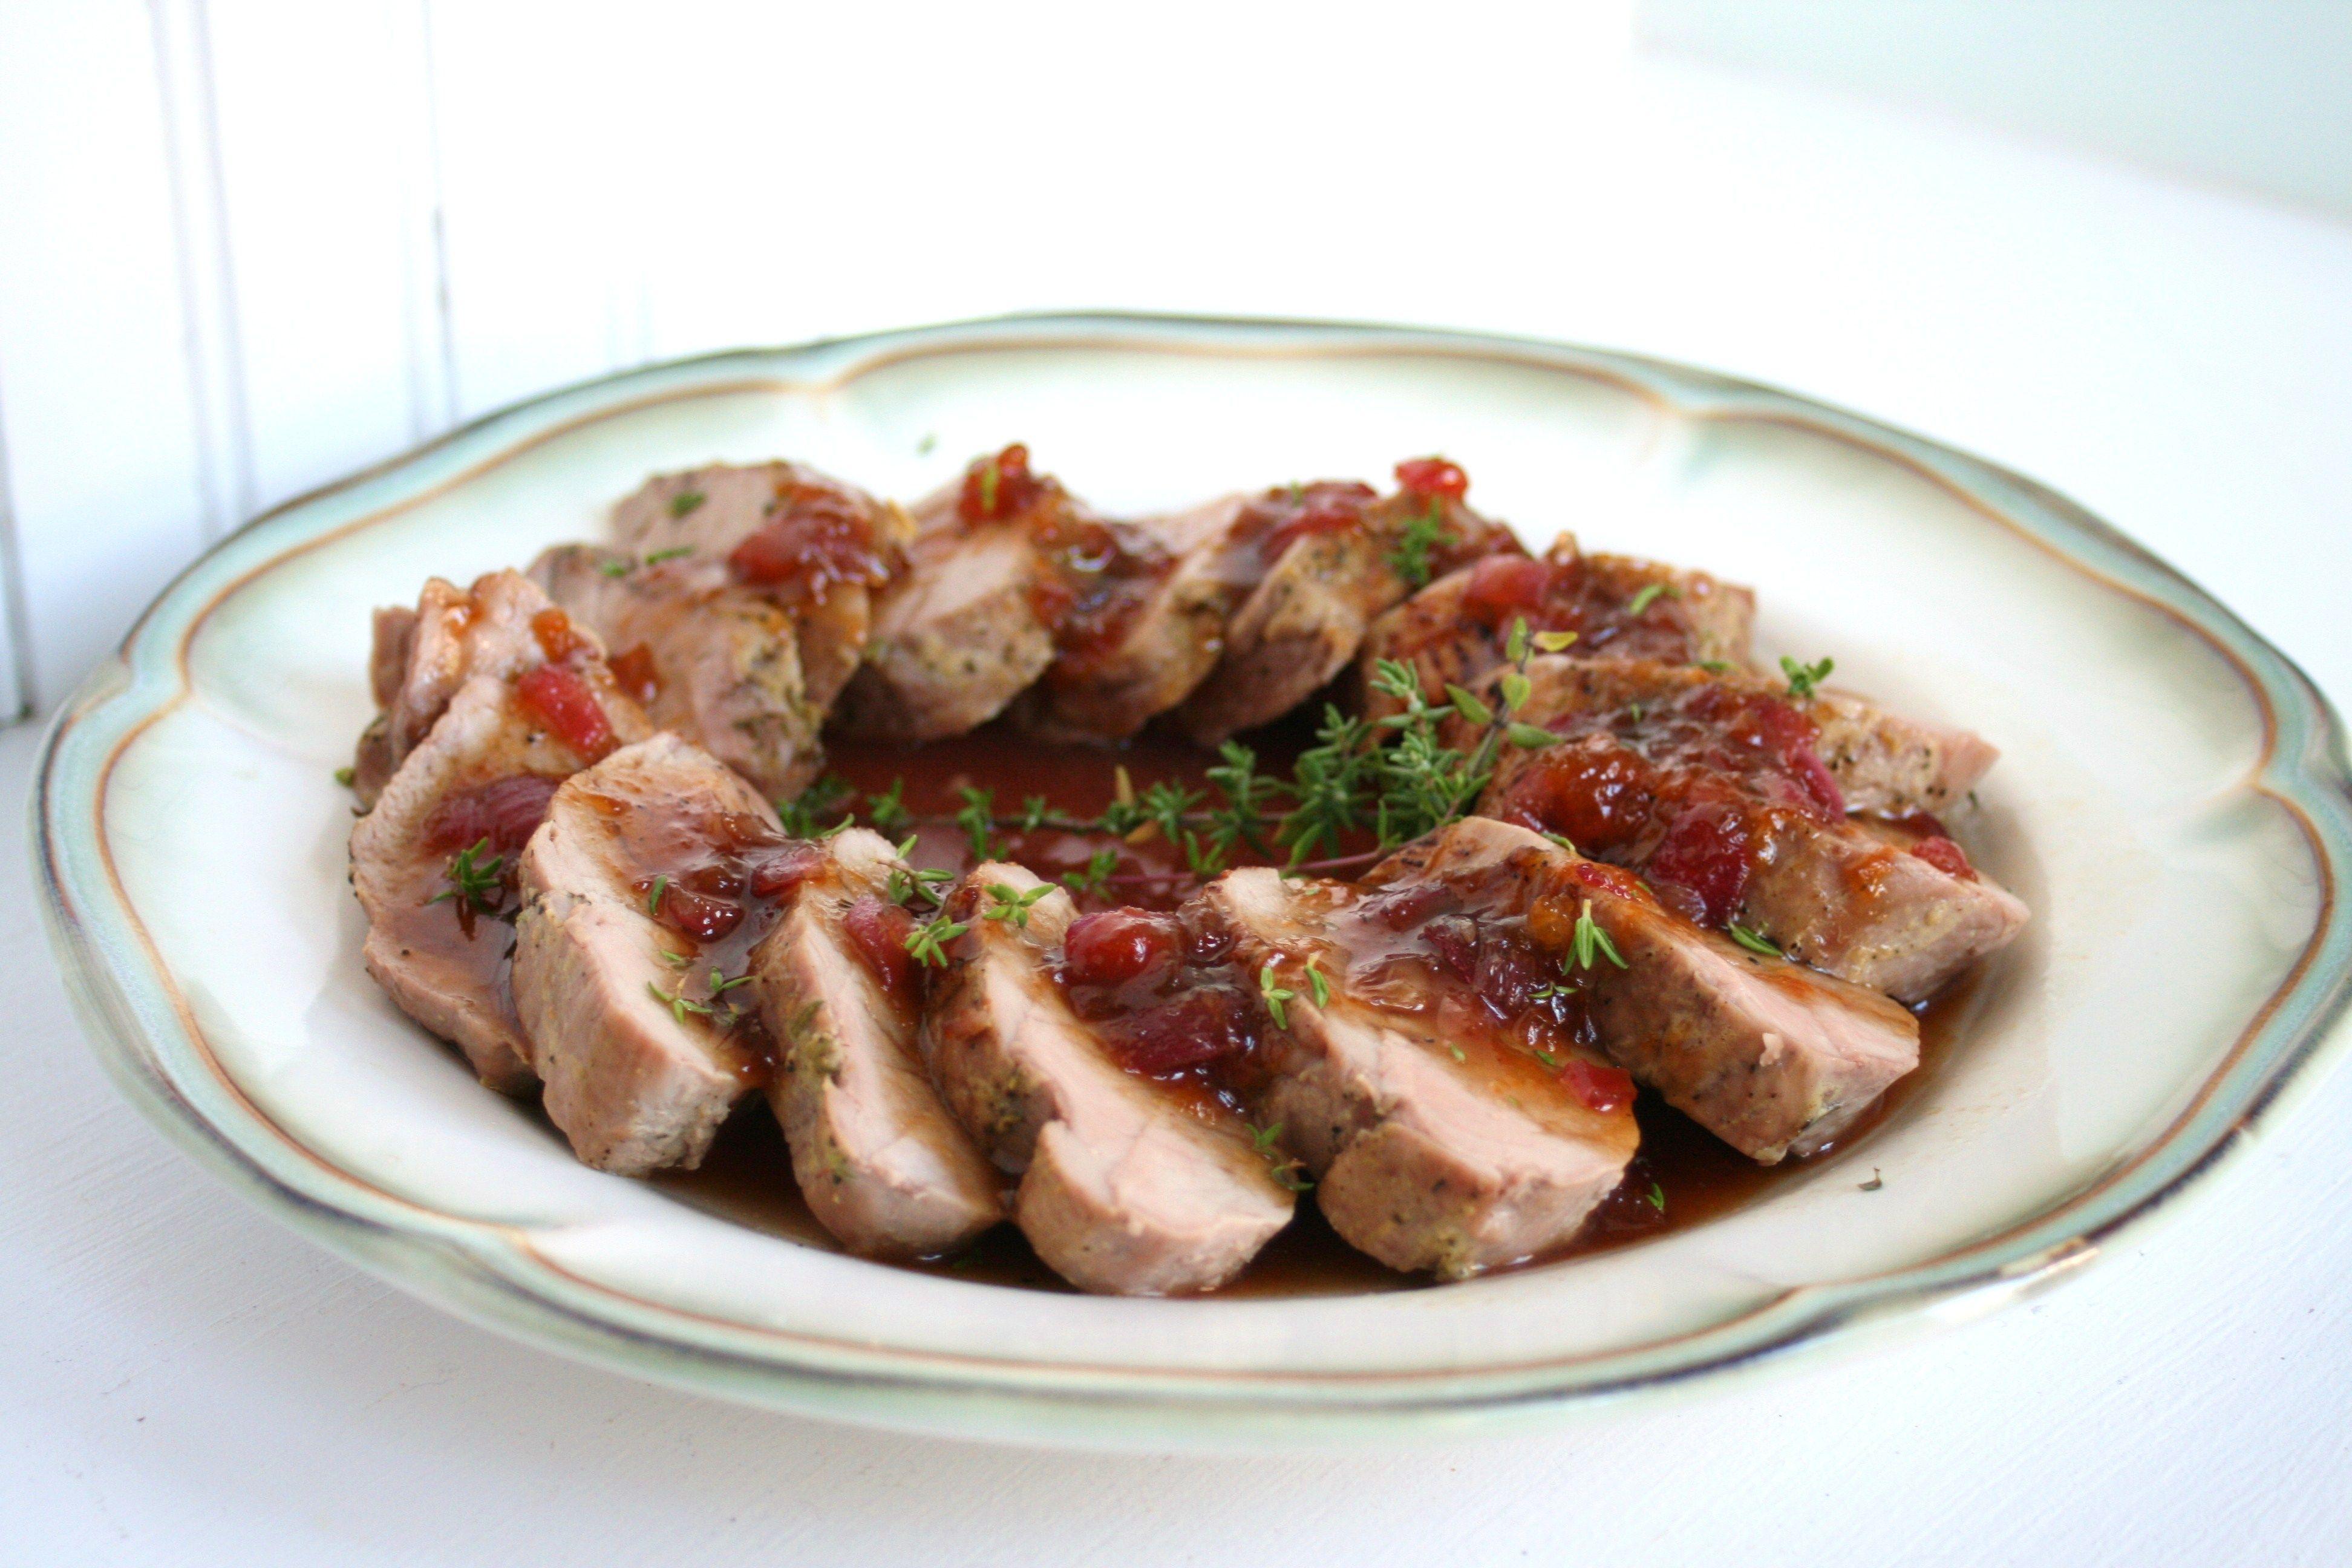 Apricot balsamic pork tenderloin recipe balsamic pork